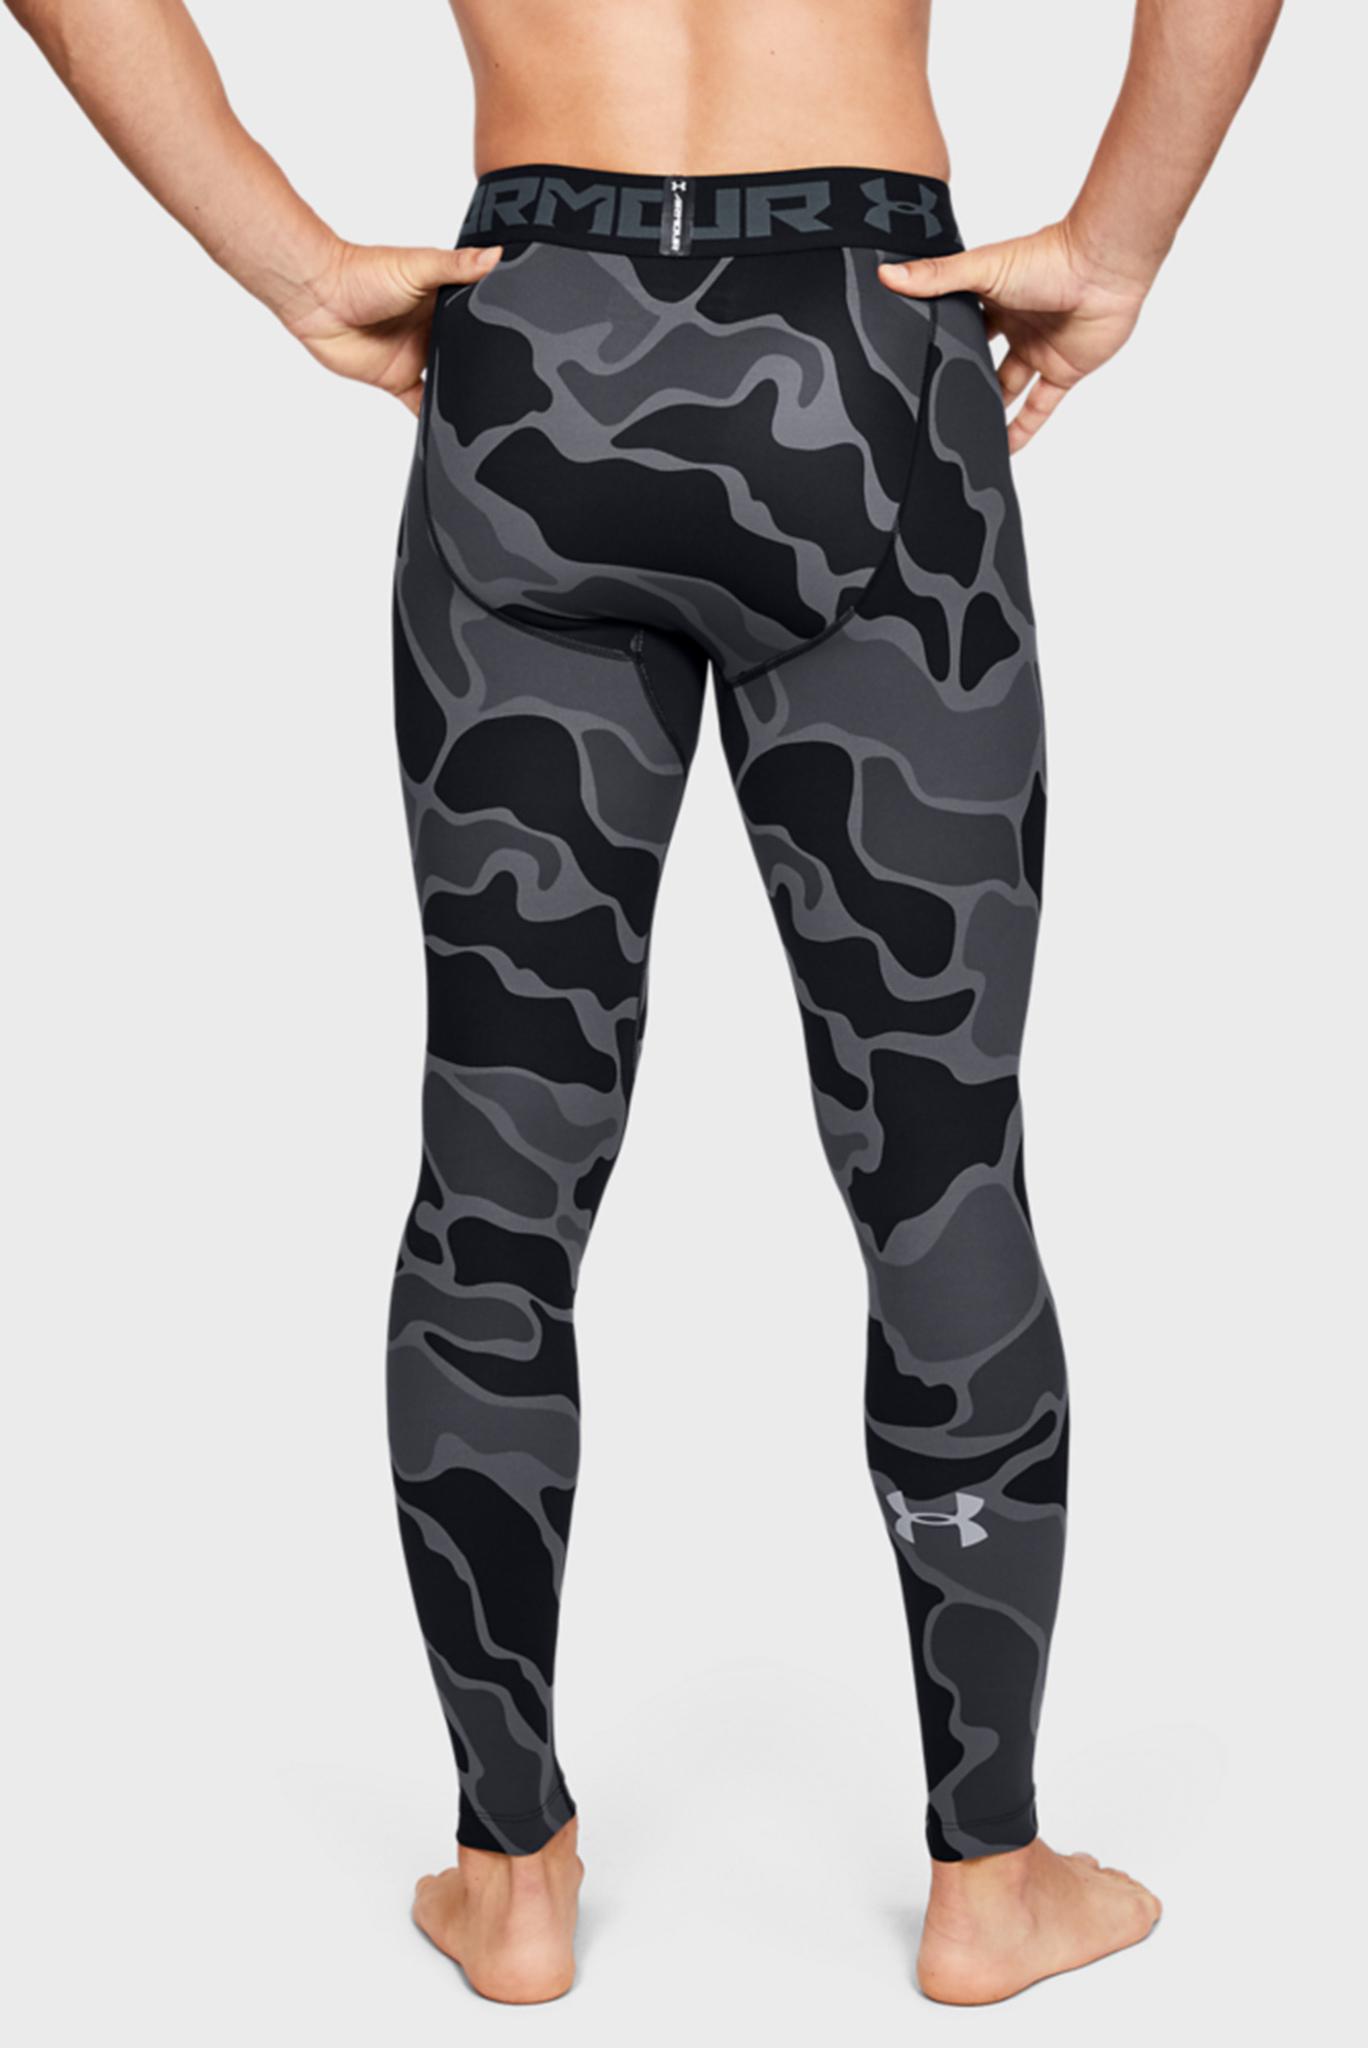 Мужские тайтсы с принтом HG Armour 2.0 Printed Leggings Under Armour